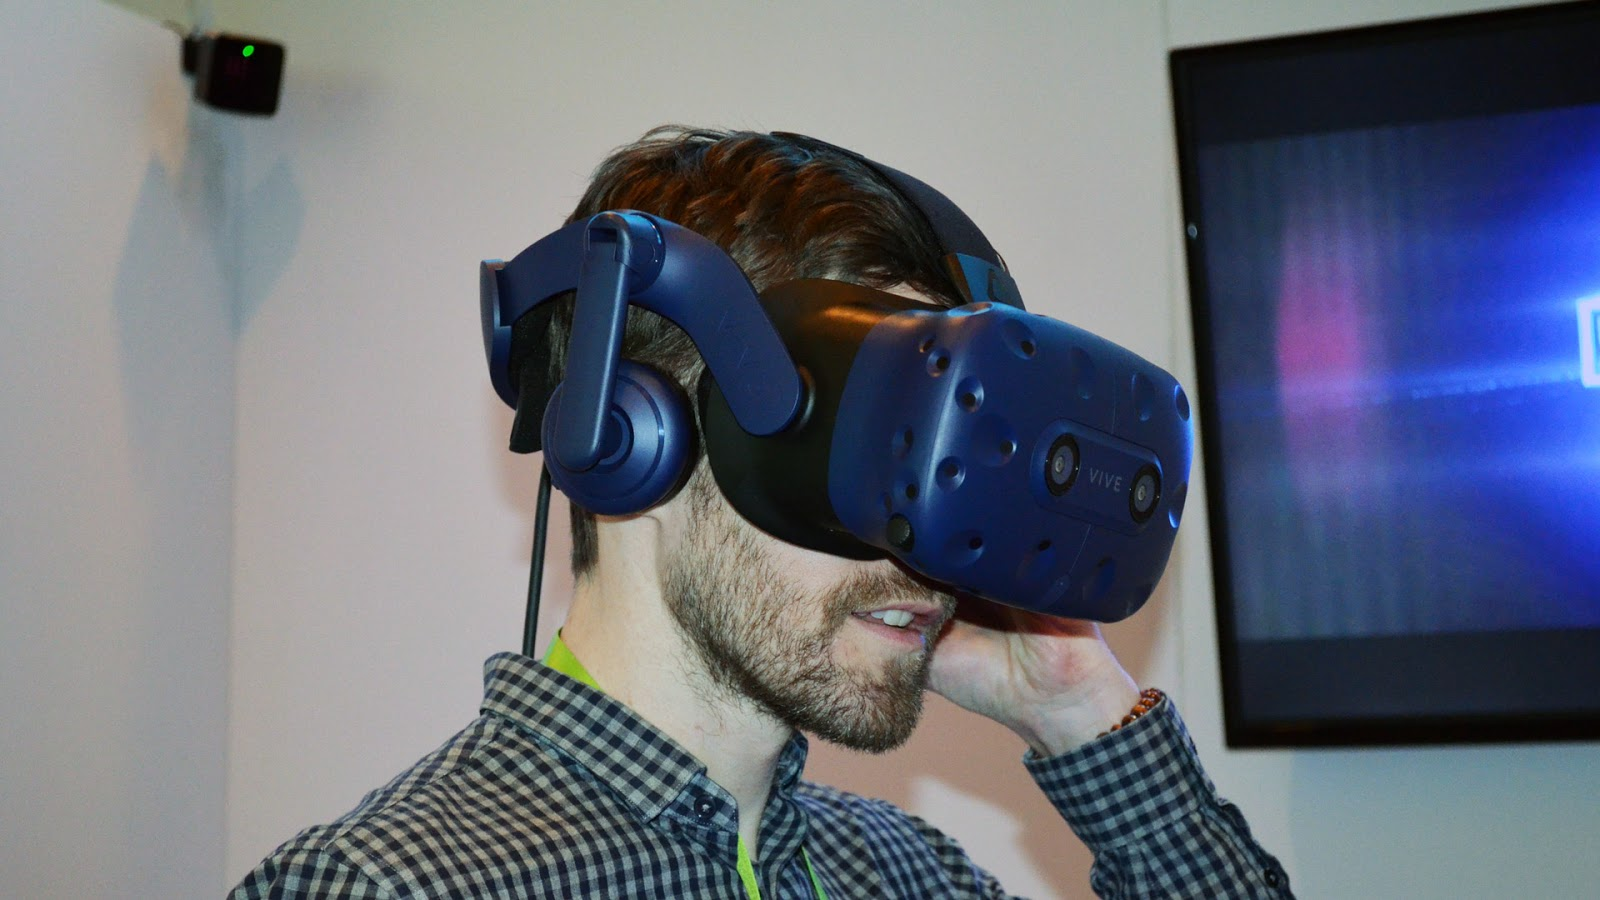 wireless-vr-htc-vive-pro-immersivetouch.jpg